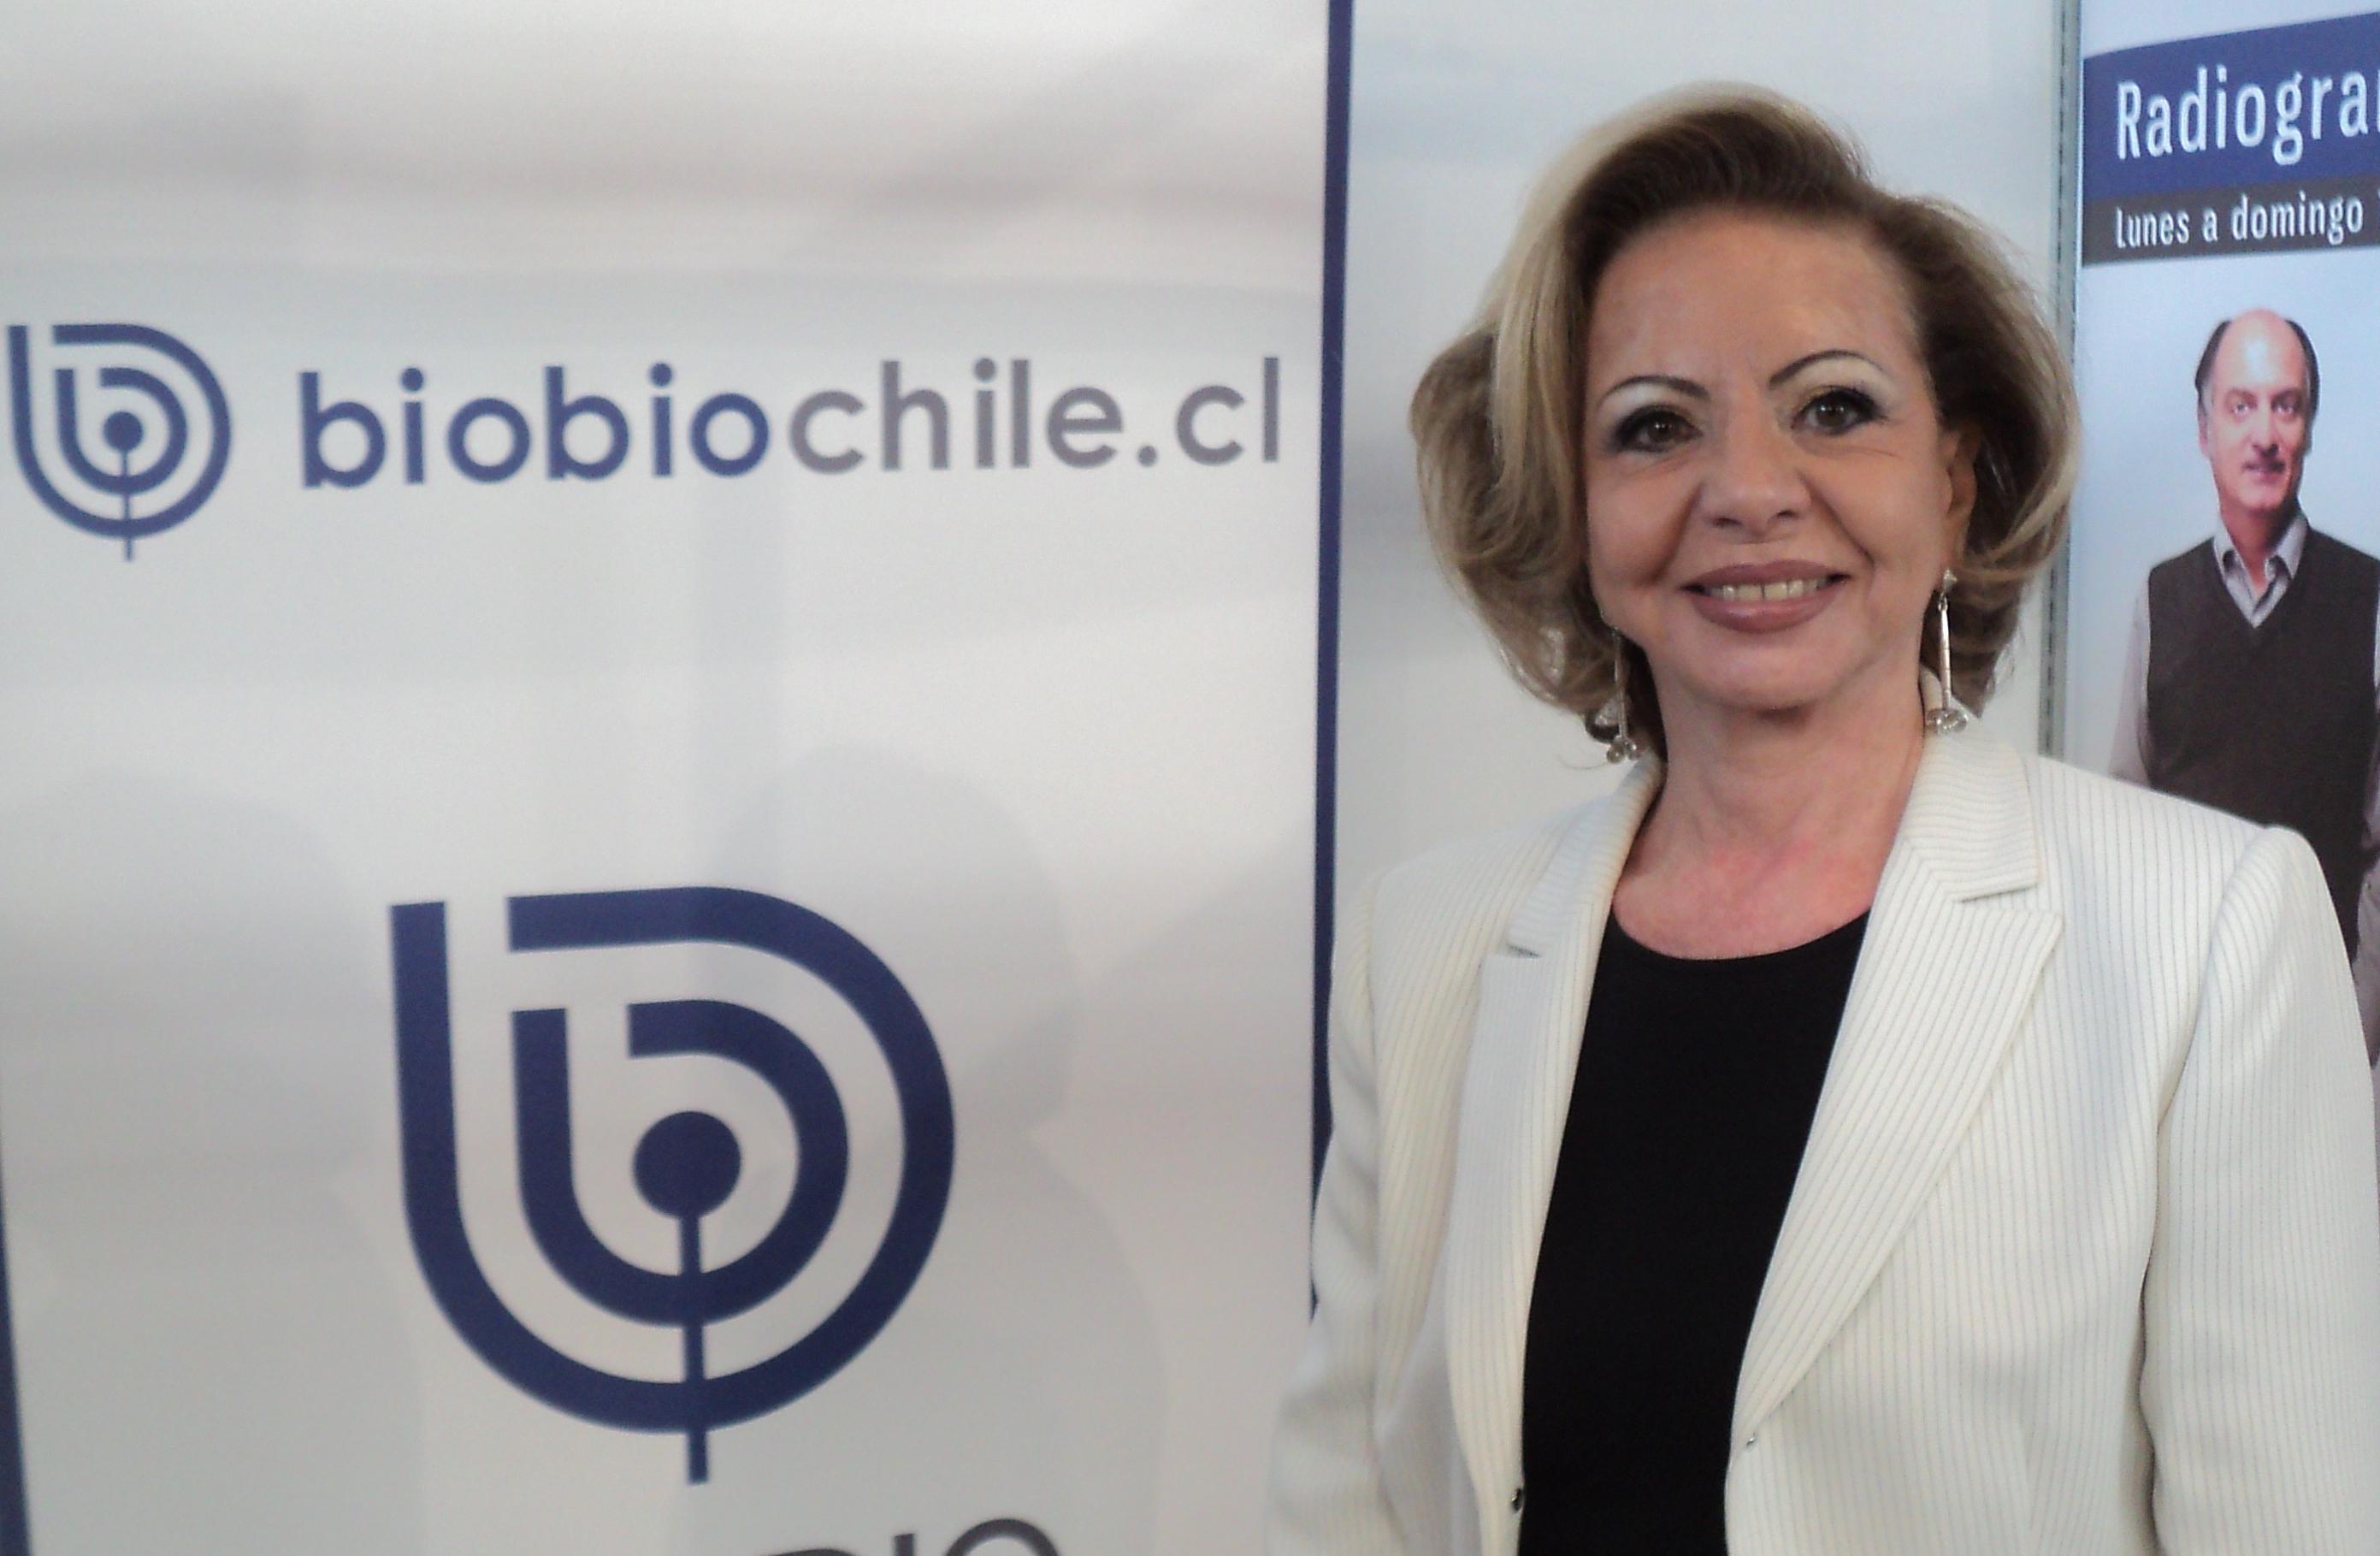 Jacqueline Rodríguez – Gerenta General de Achiga. Foto: biobiochile.cl